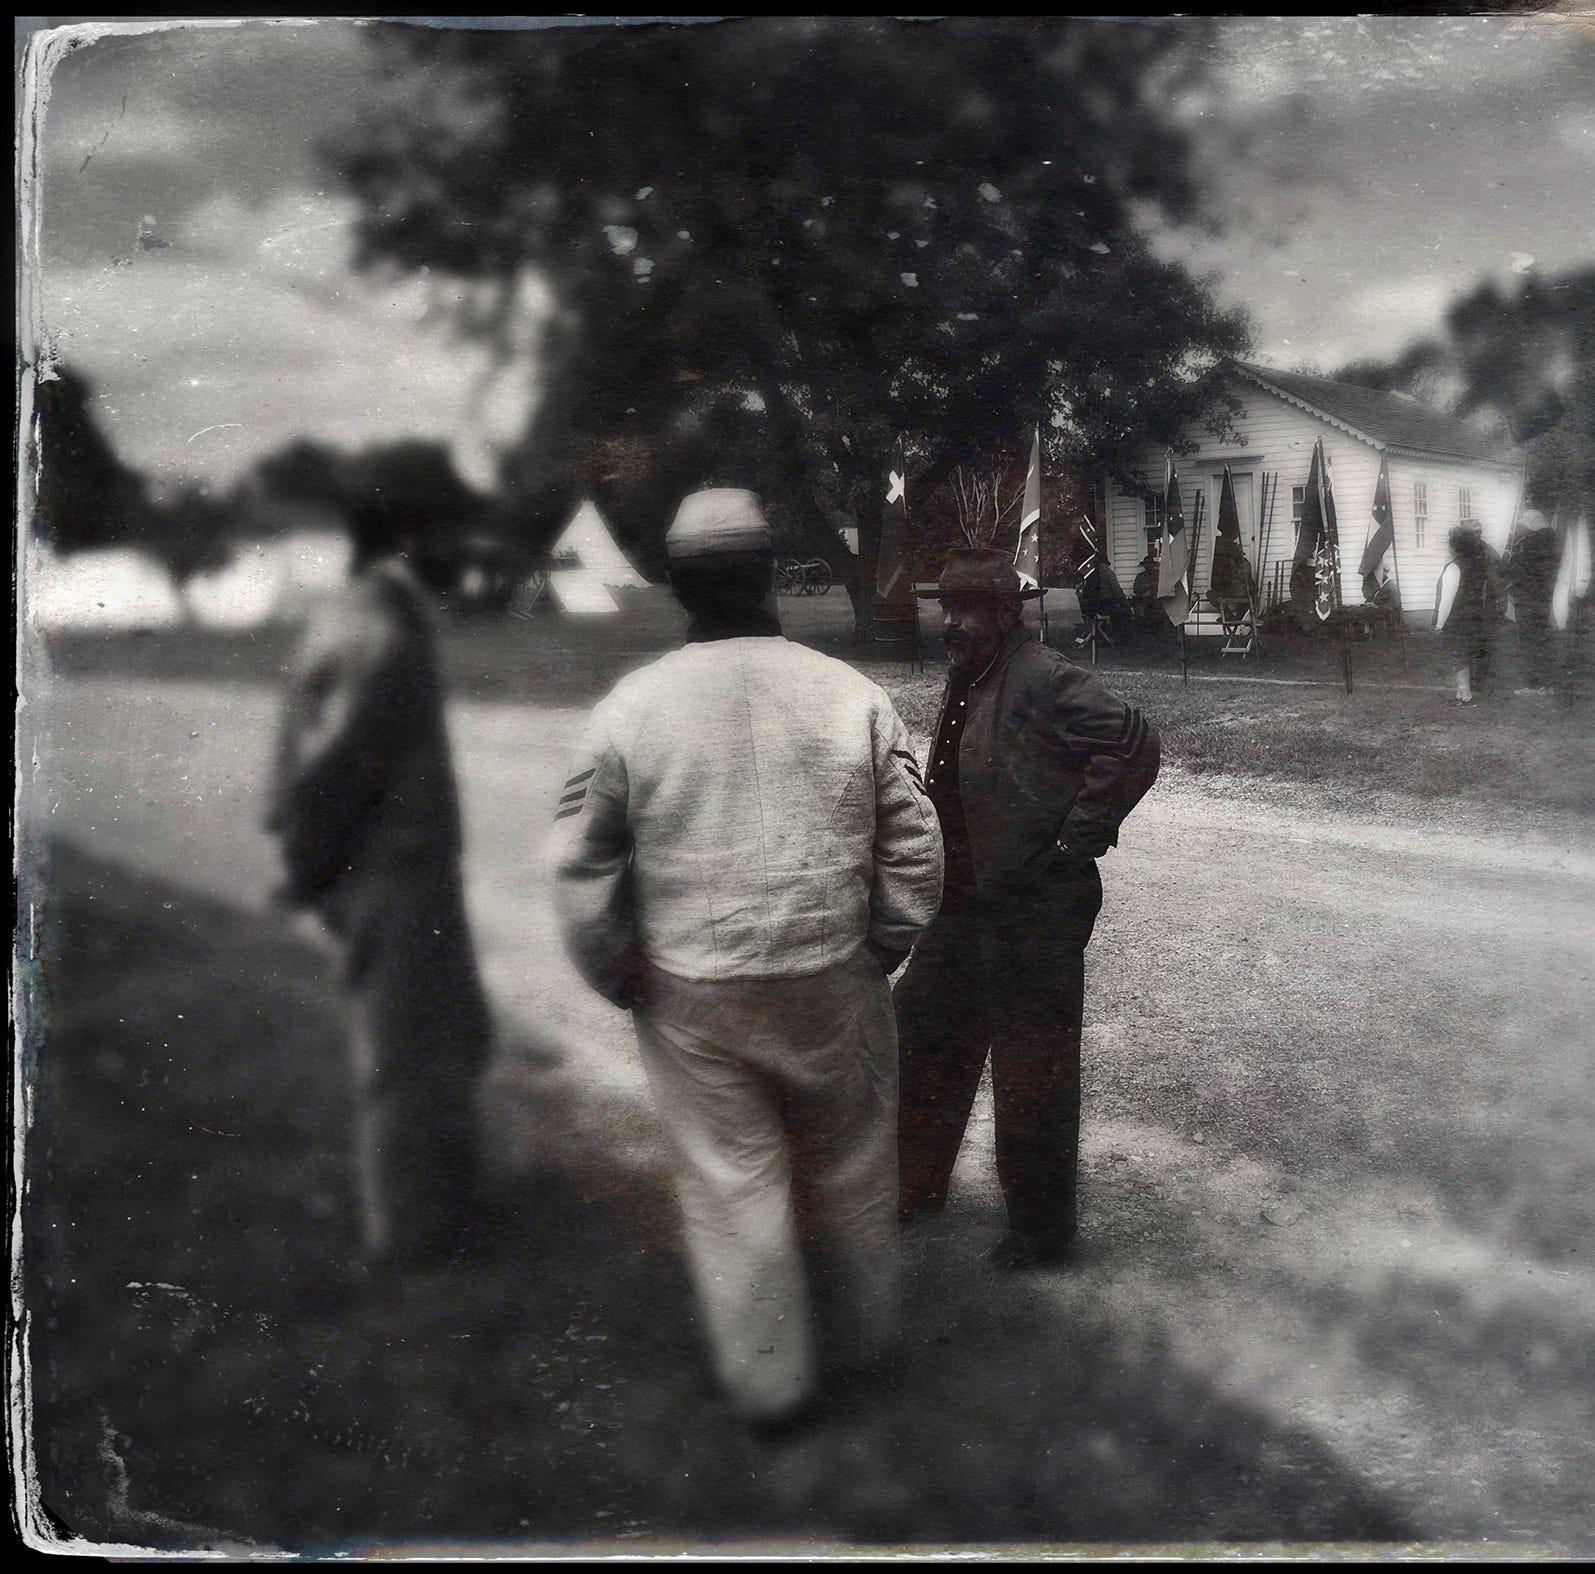 17th Michigan Volunteer Infantry Civil War reenactors gather at Greenmead Historical Park